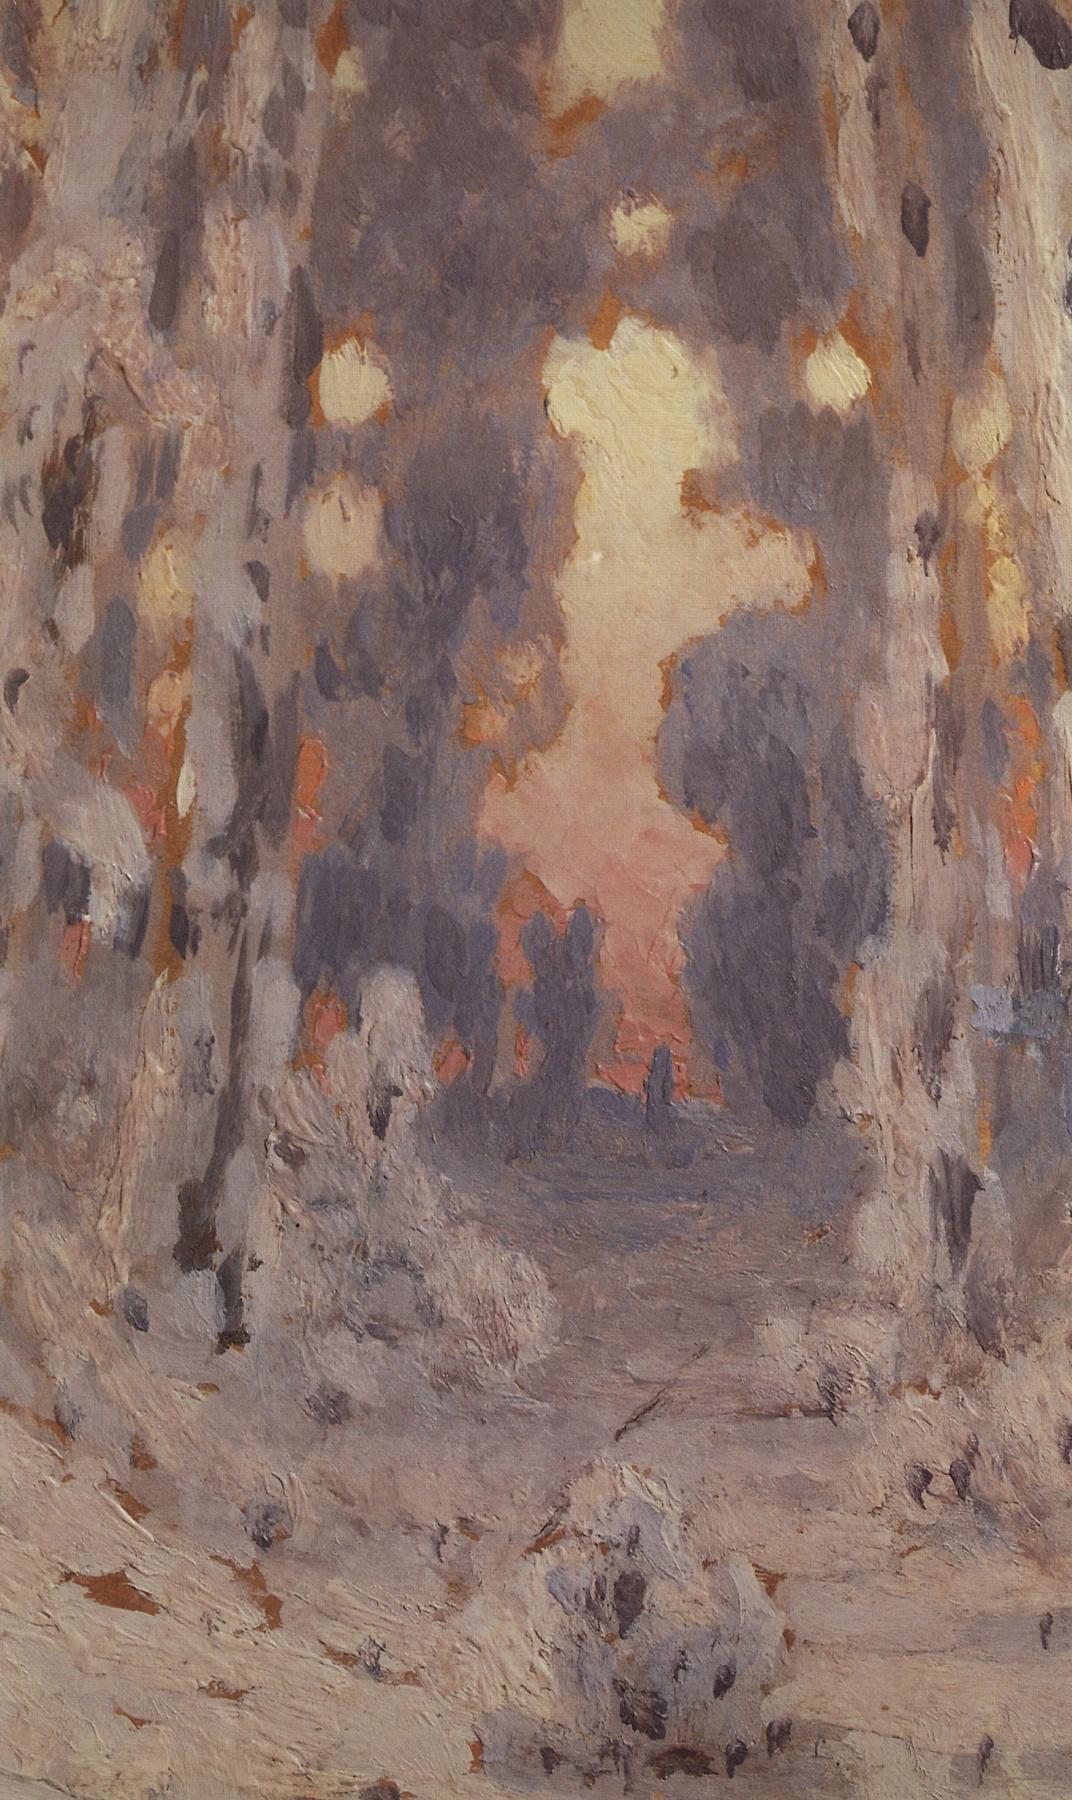 Arkhip Kuindzhi. Sun spots on hoarfrost. Sunset in the forest